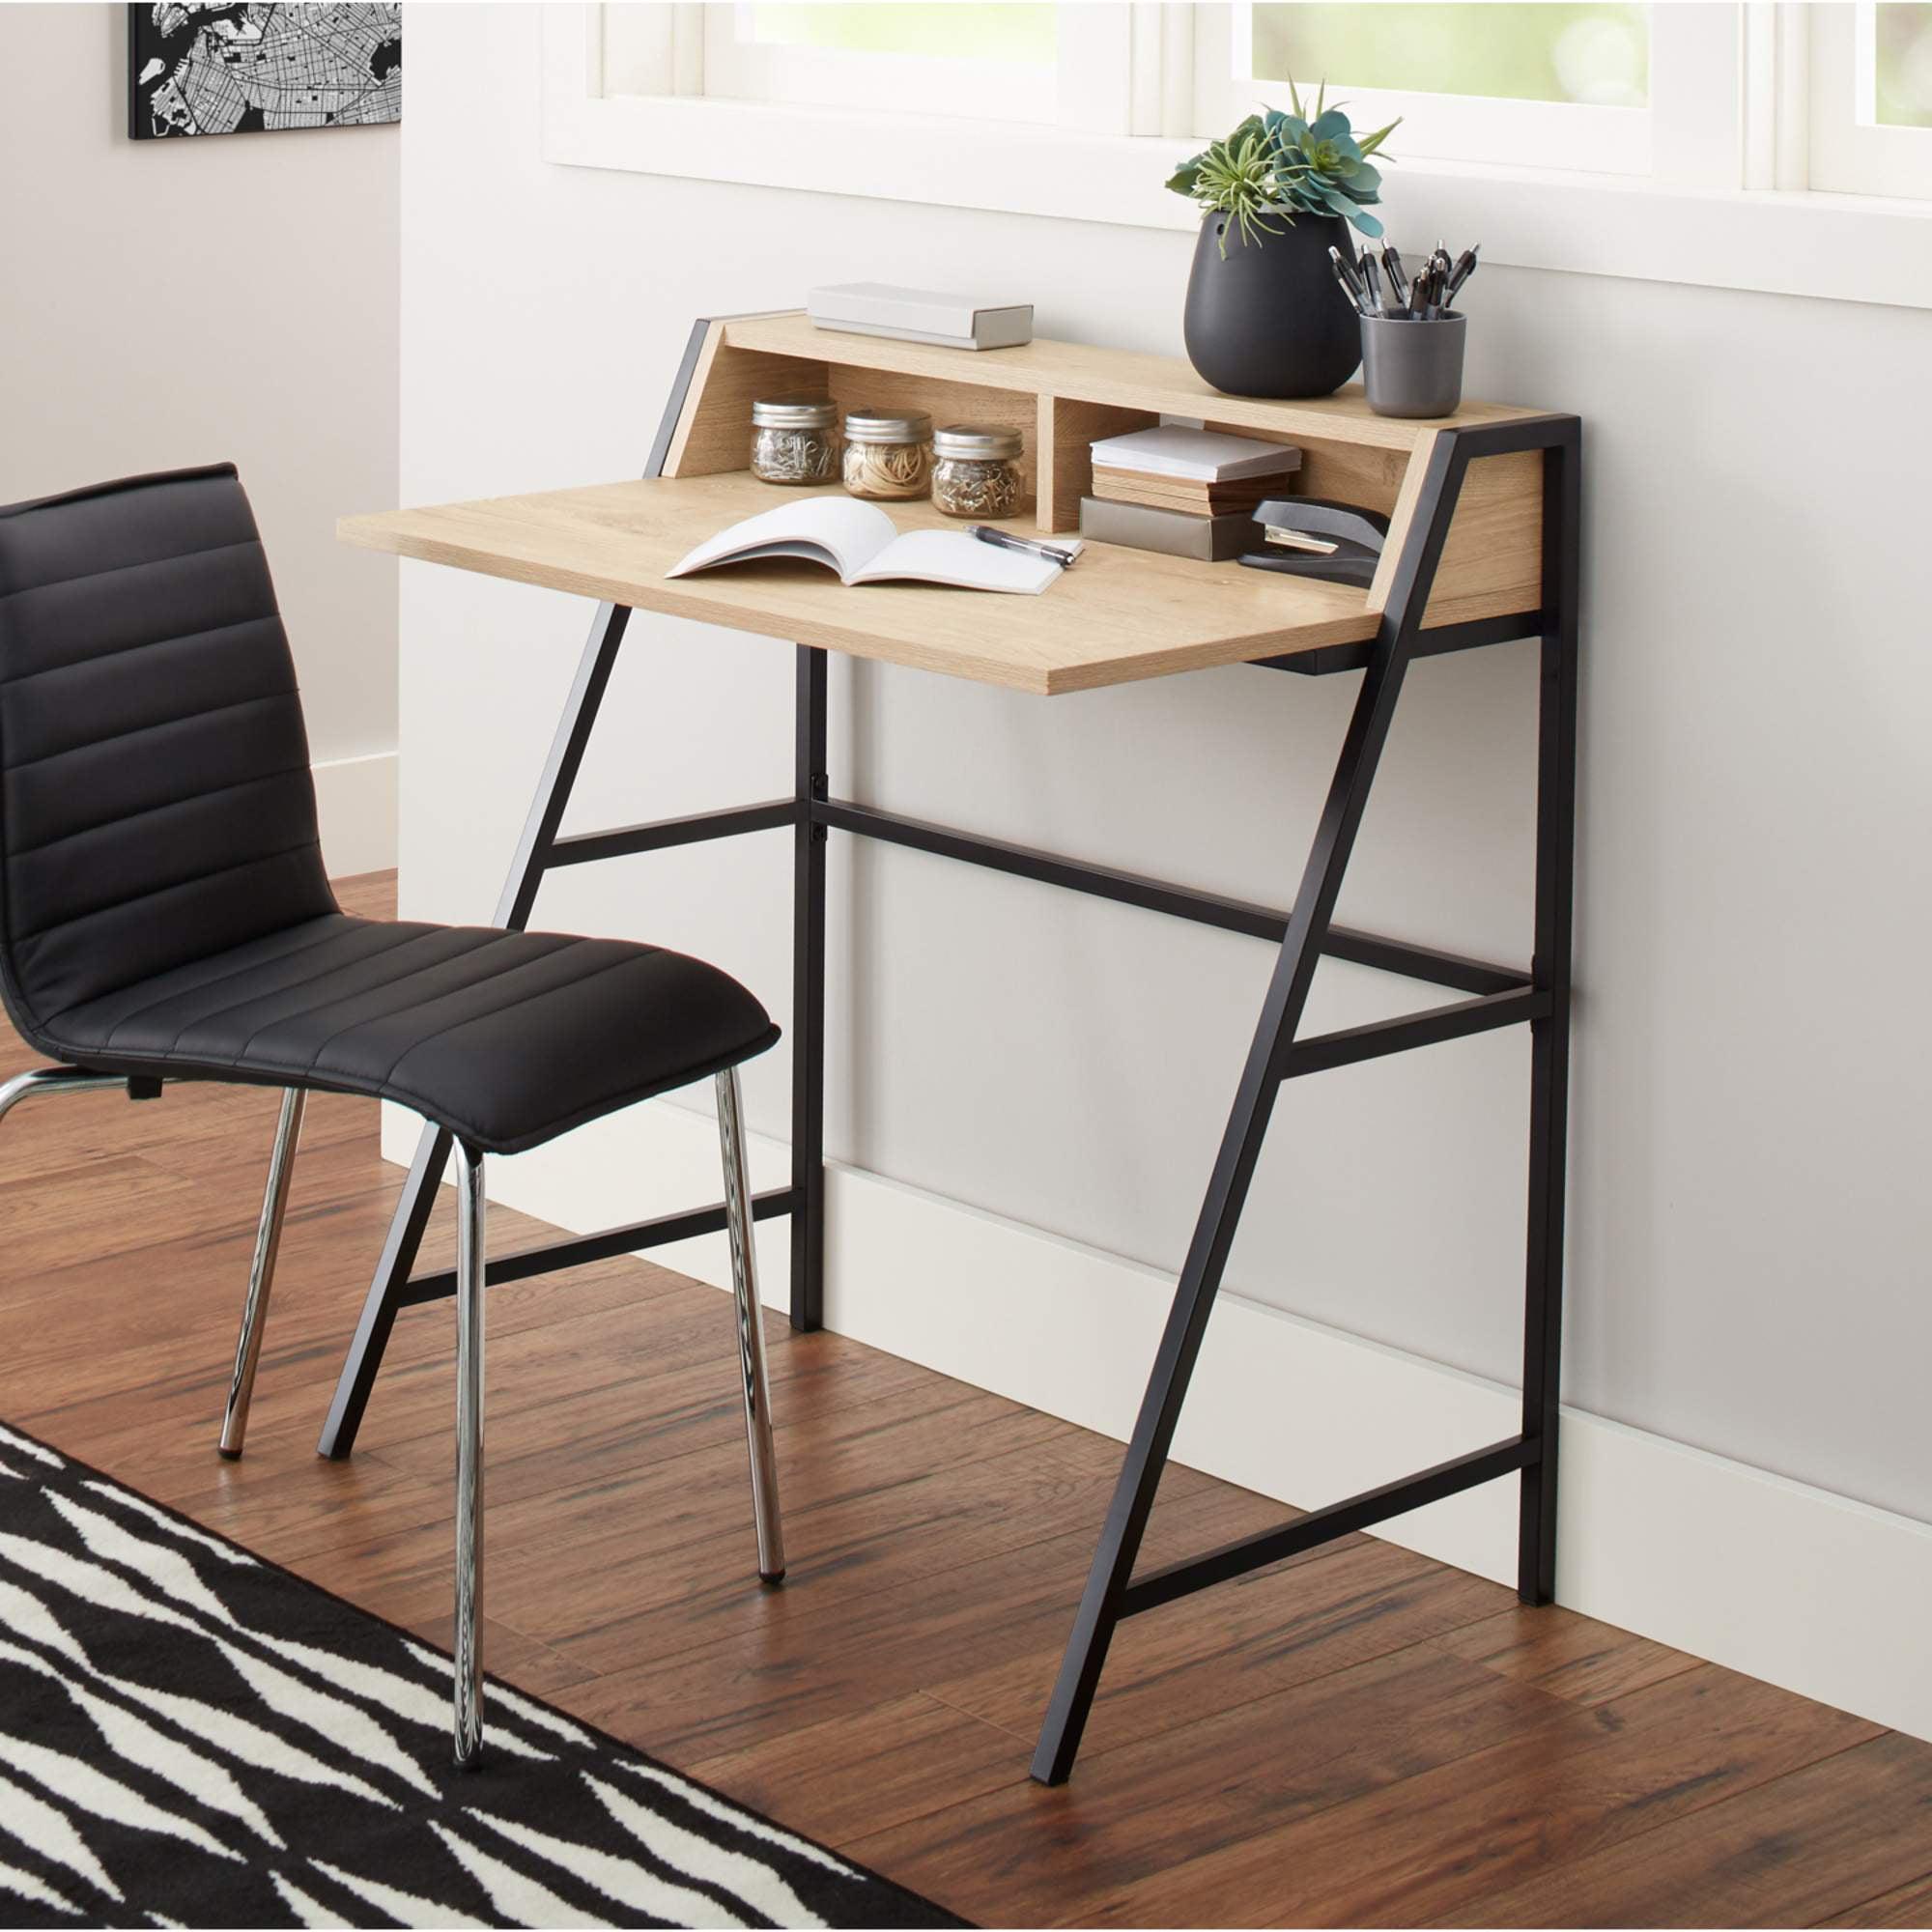 Mainstays Conrad Desk With Hutch by Mainstays